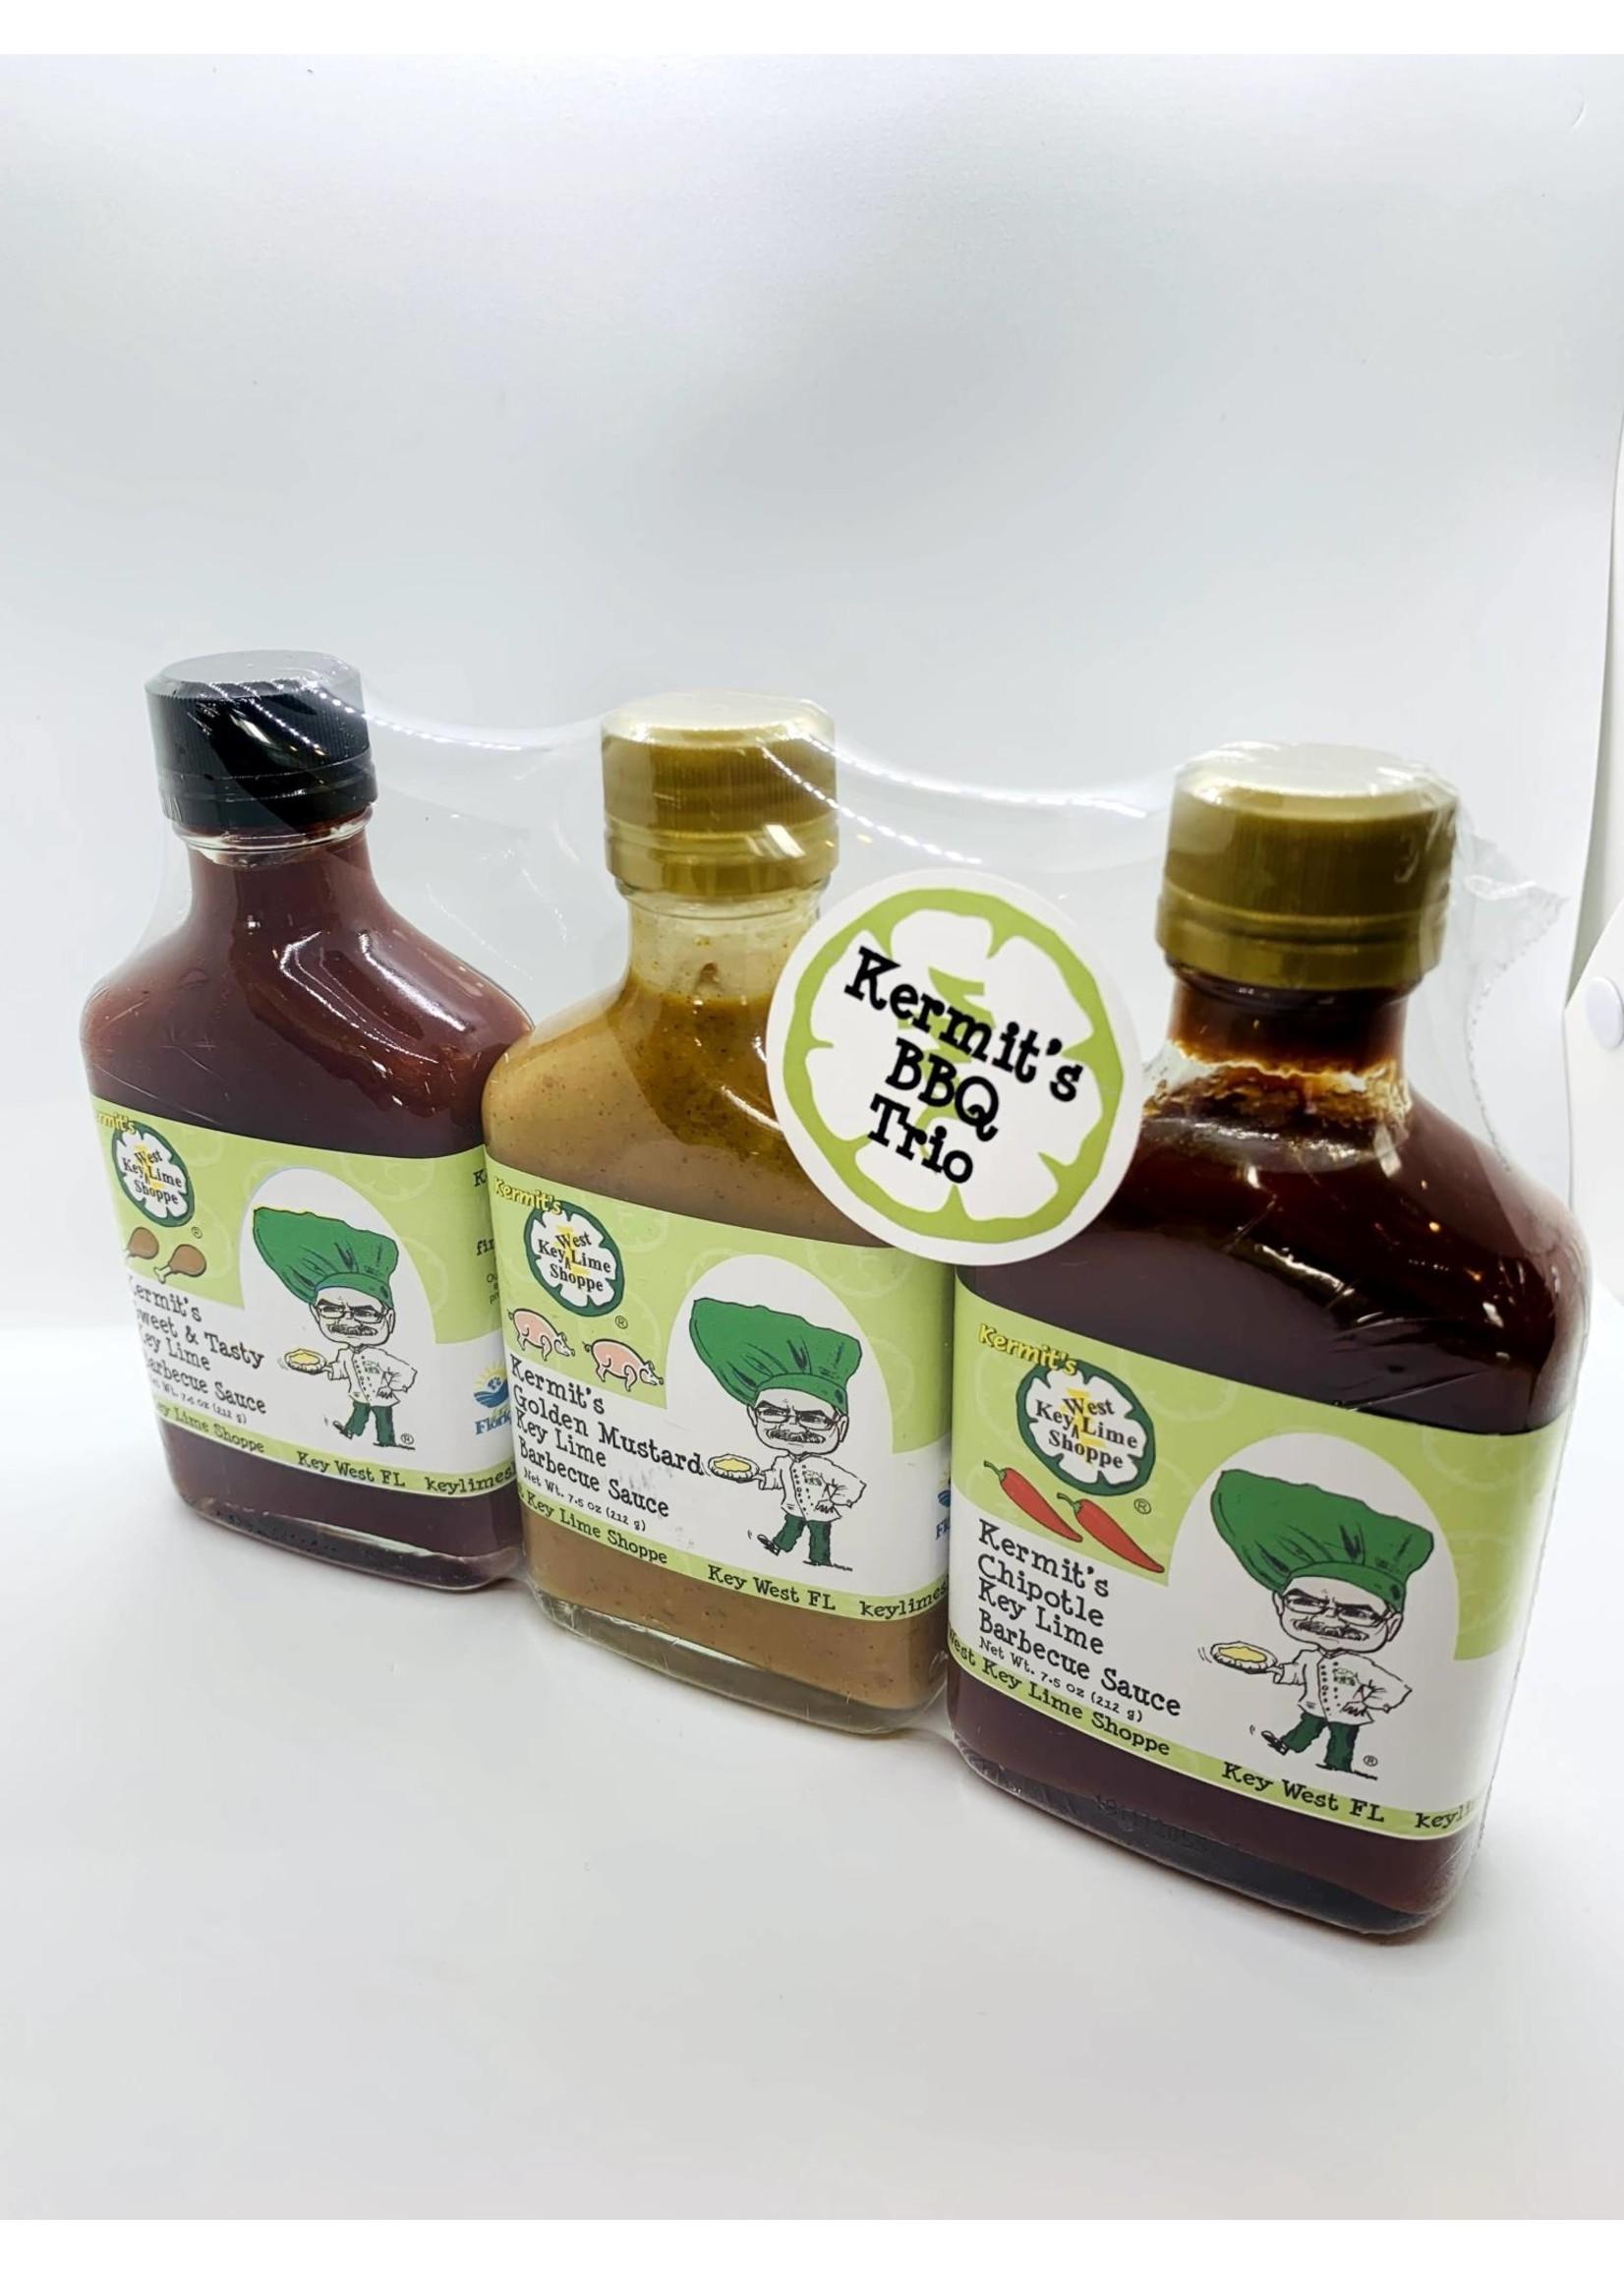 Kermit's Key Lime Barbecue Sauce Trio